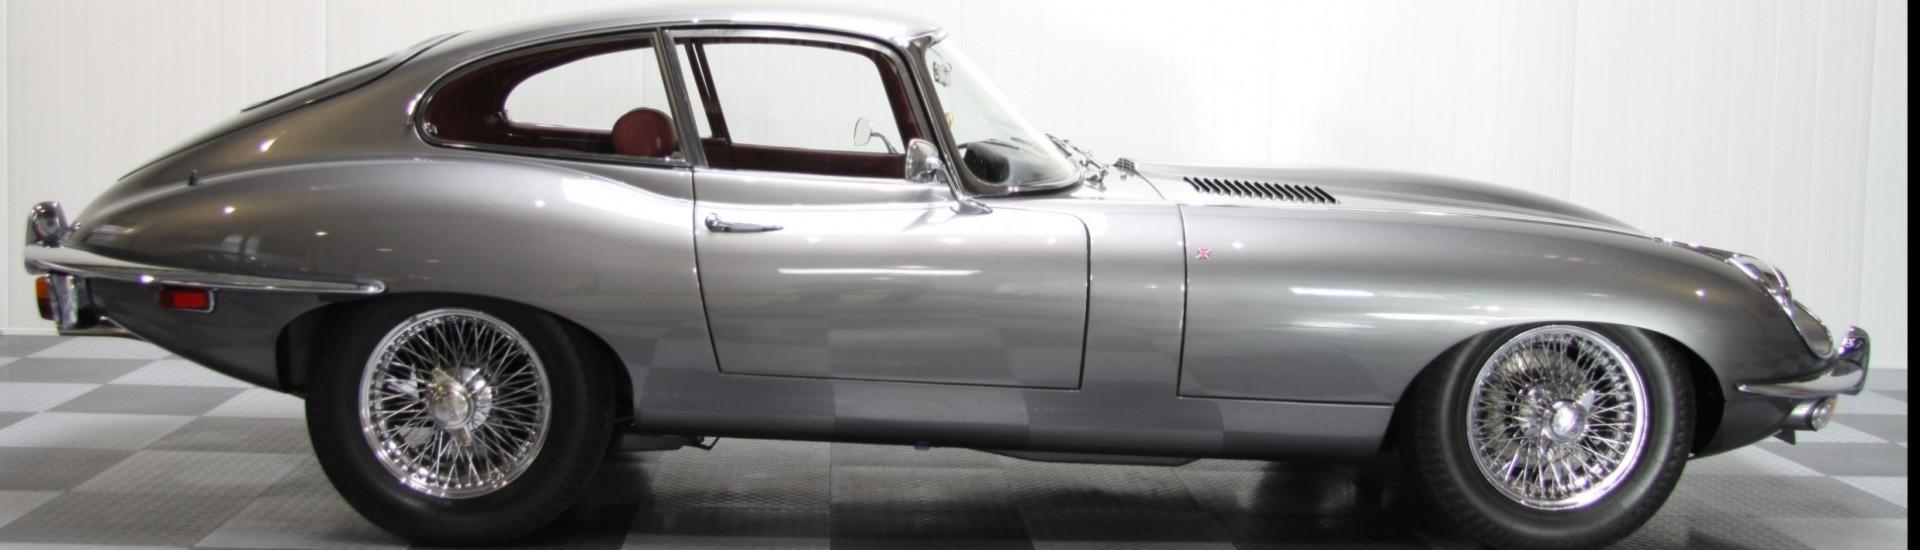 Dream Garage Sold Carsjaguar Jaguar E Type Coupe 4 2